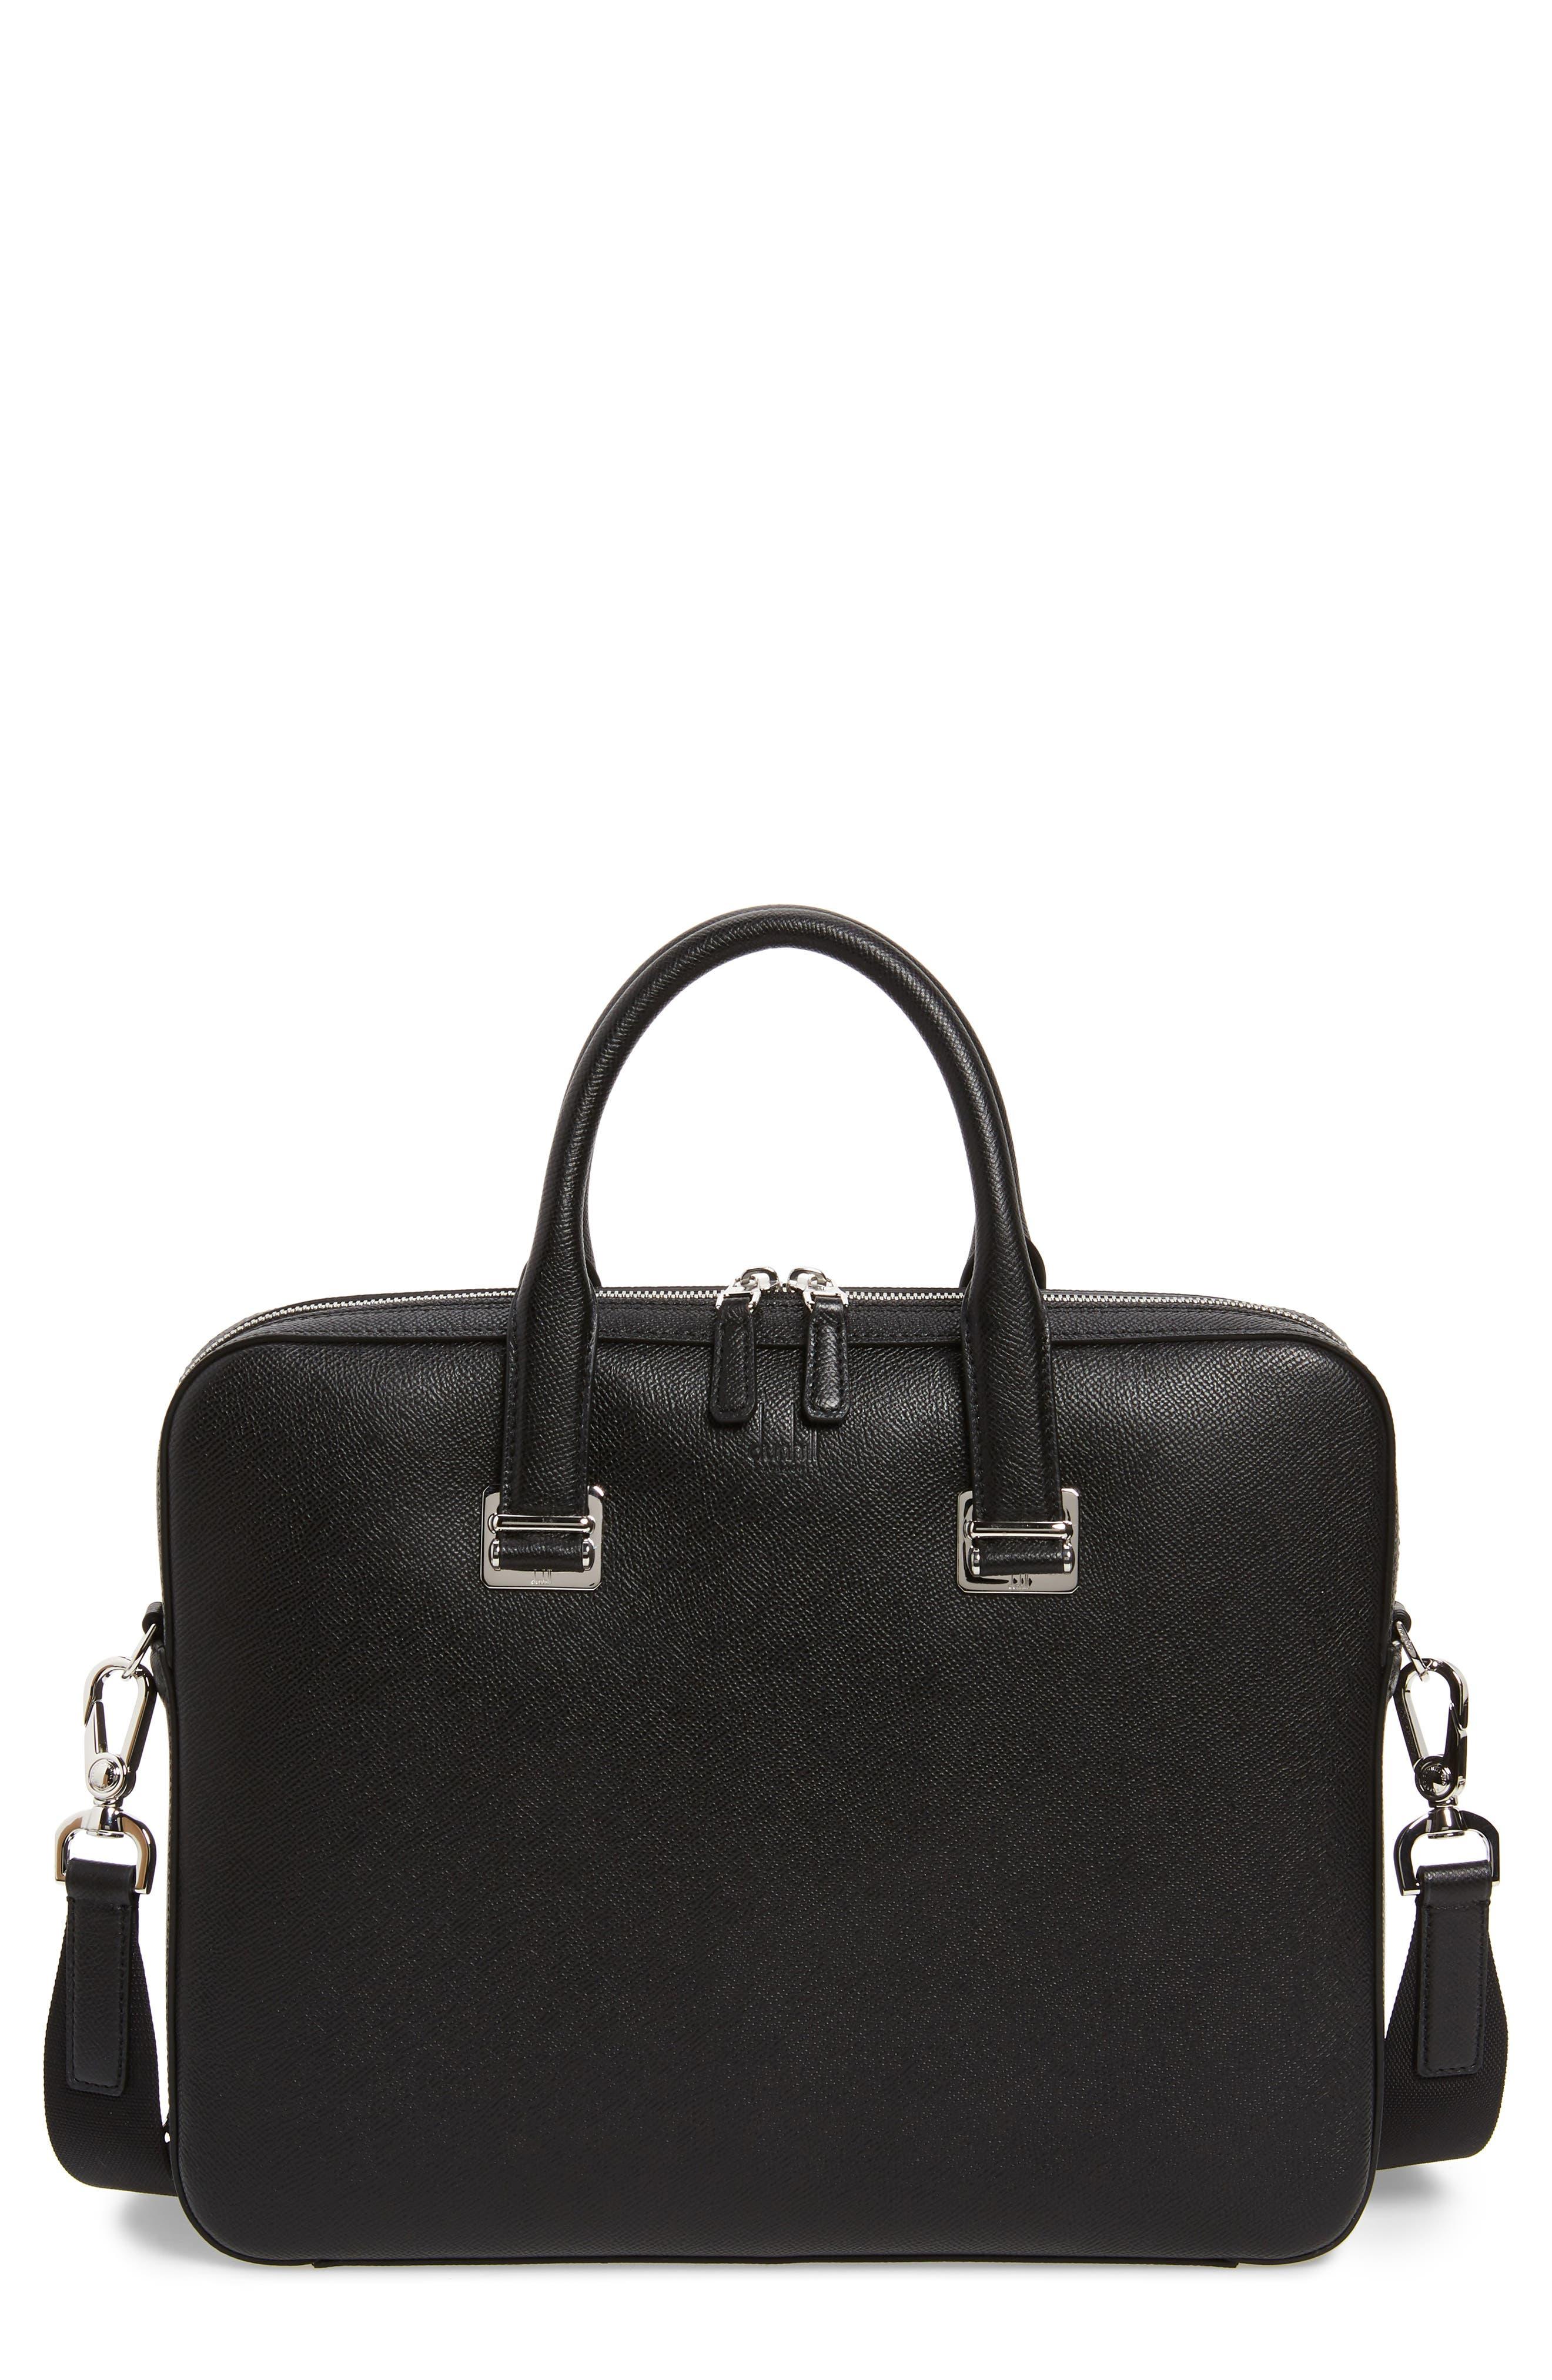 DUNHILL Cadogan Leather Single Document Case, Main, color, BLACK